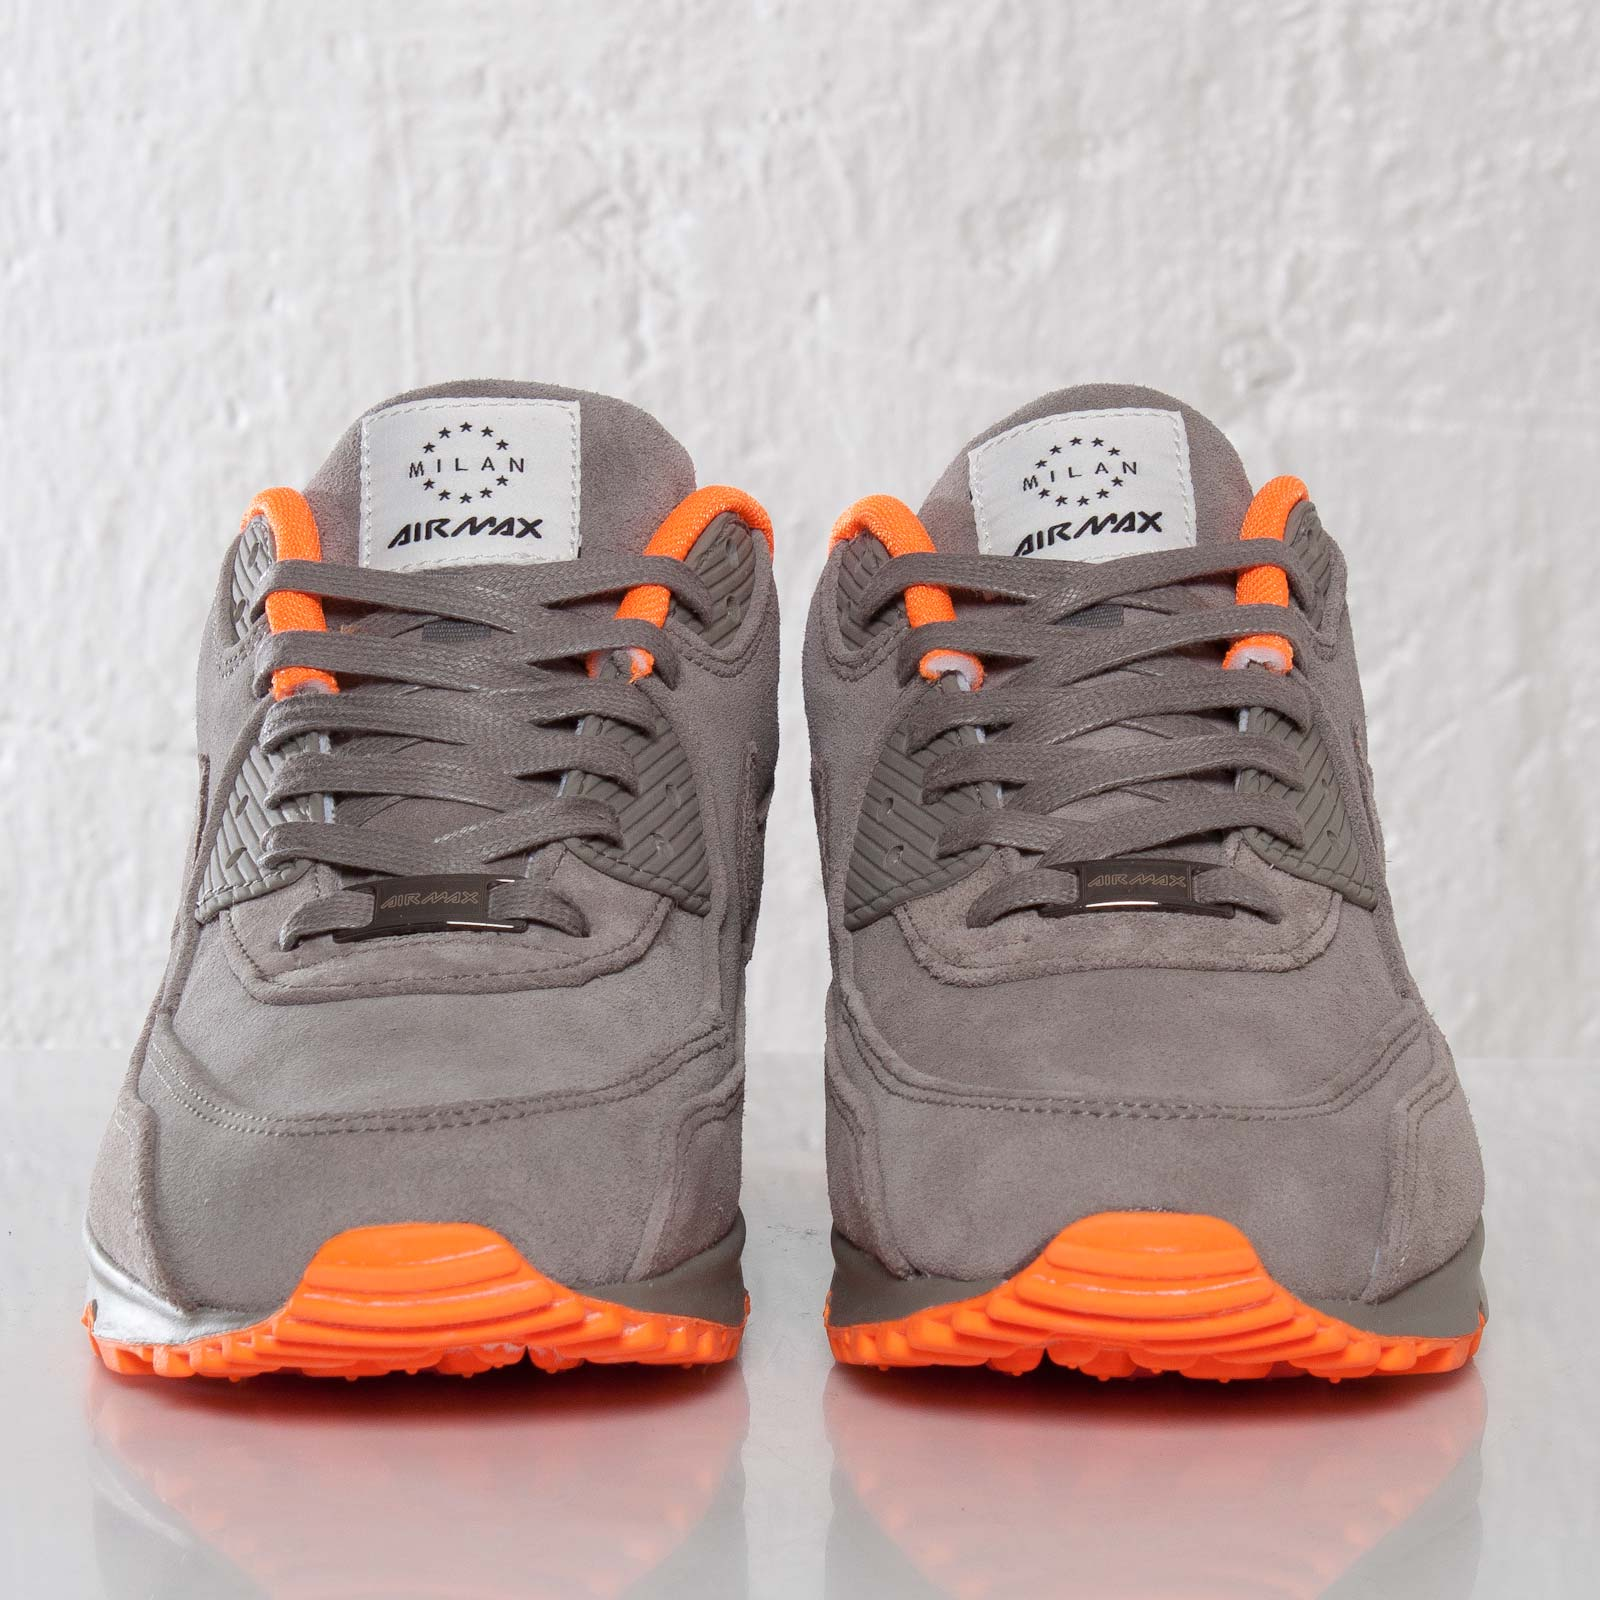 Nike Air Max 90 Milano QS 586848 221 Sneakersnstuff